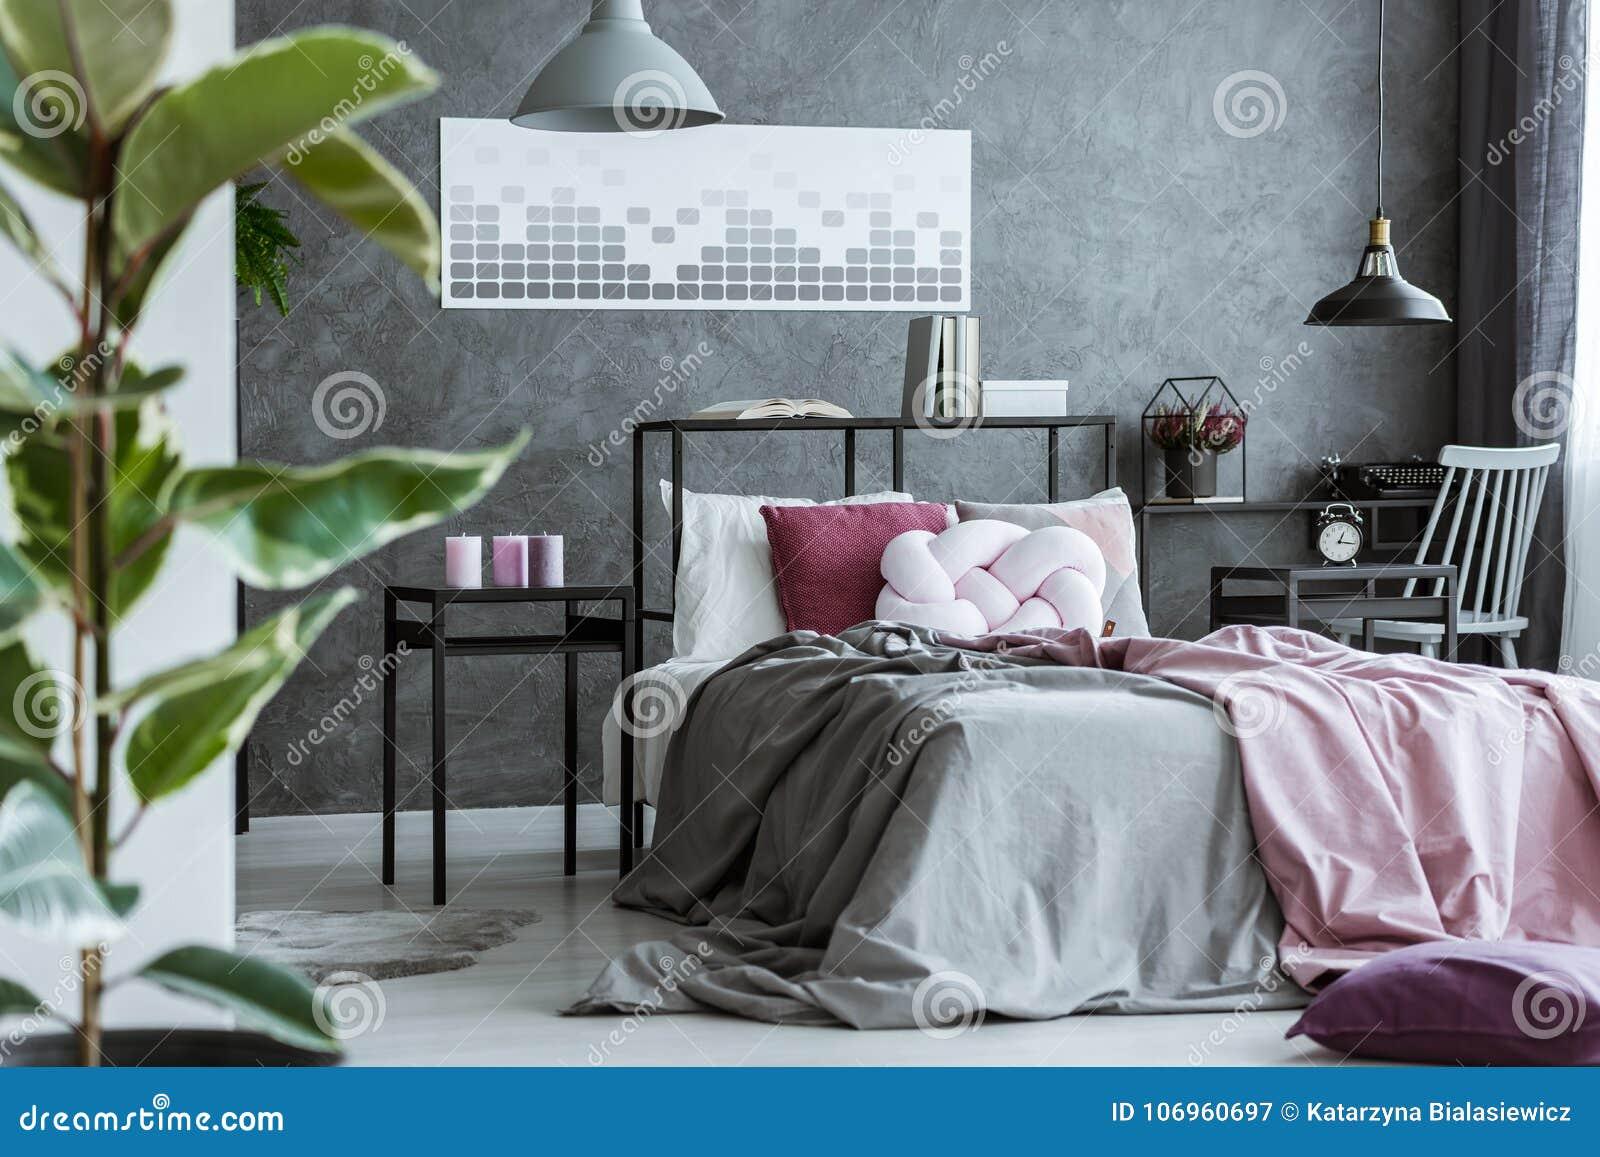 Dark Pink Bedroom Interior Stock Image Image Of Concrete 106960697